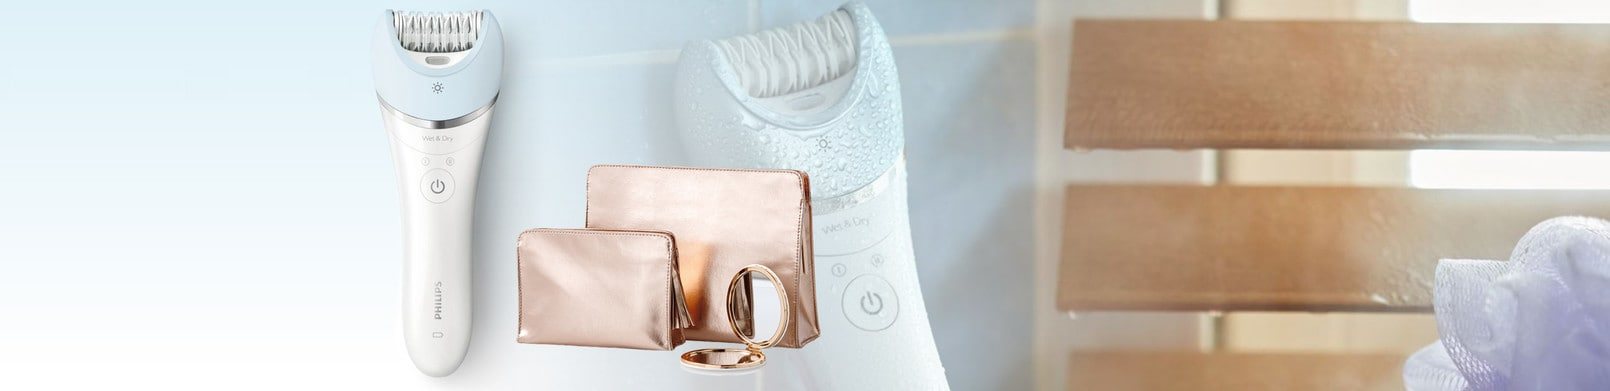 Philips Epilierer inkl beauty bags